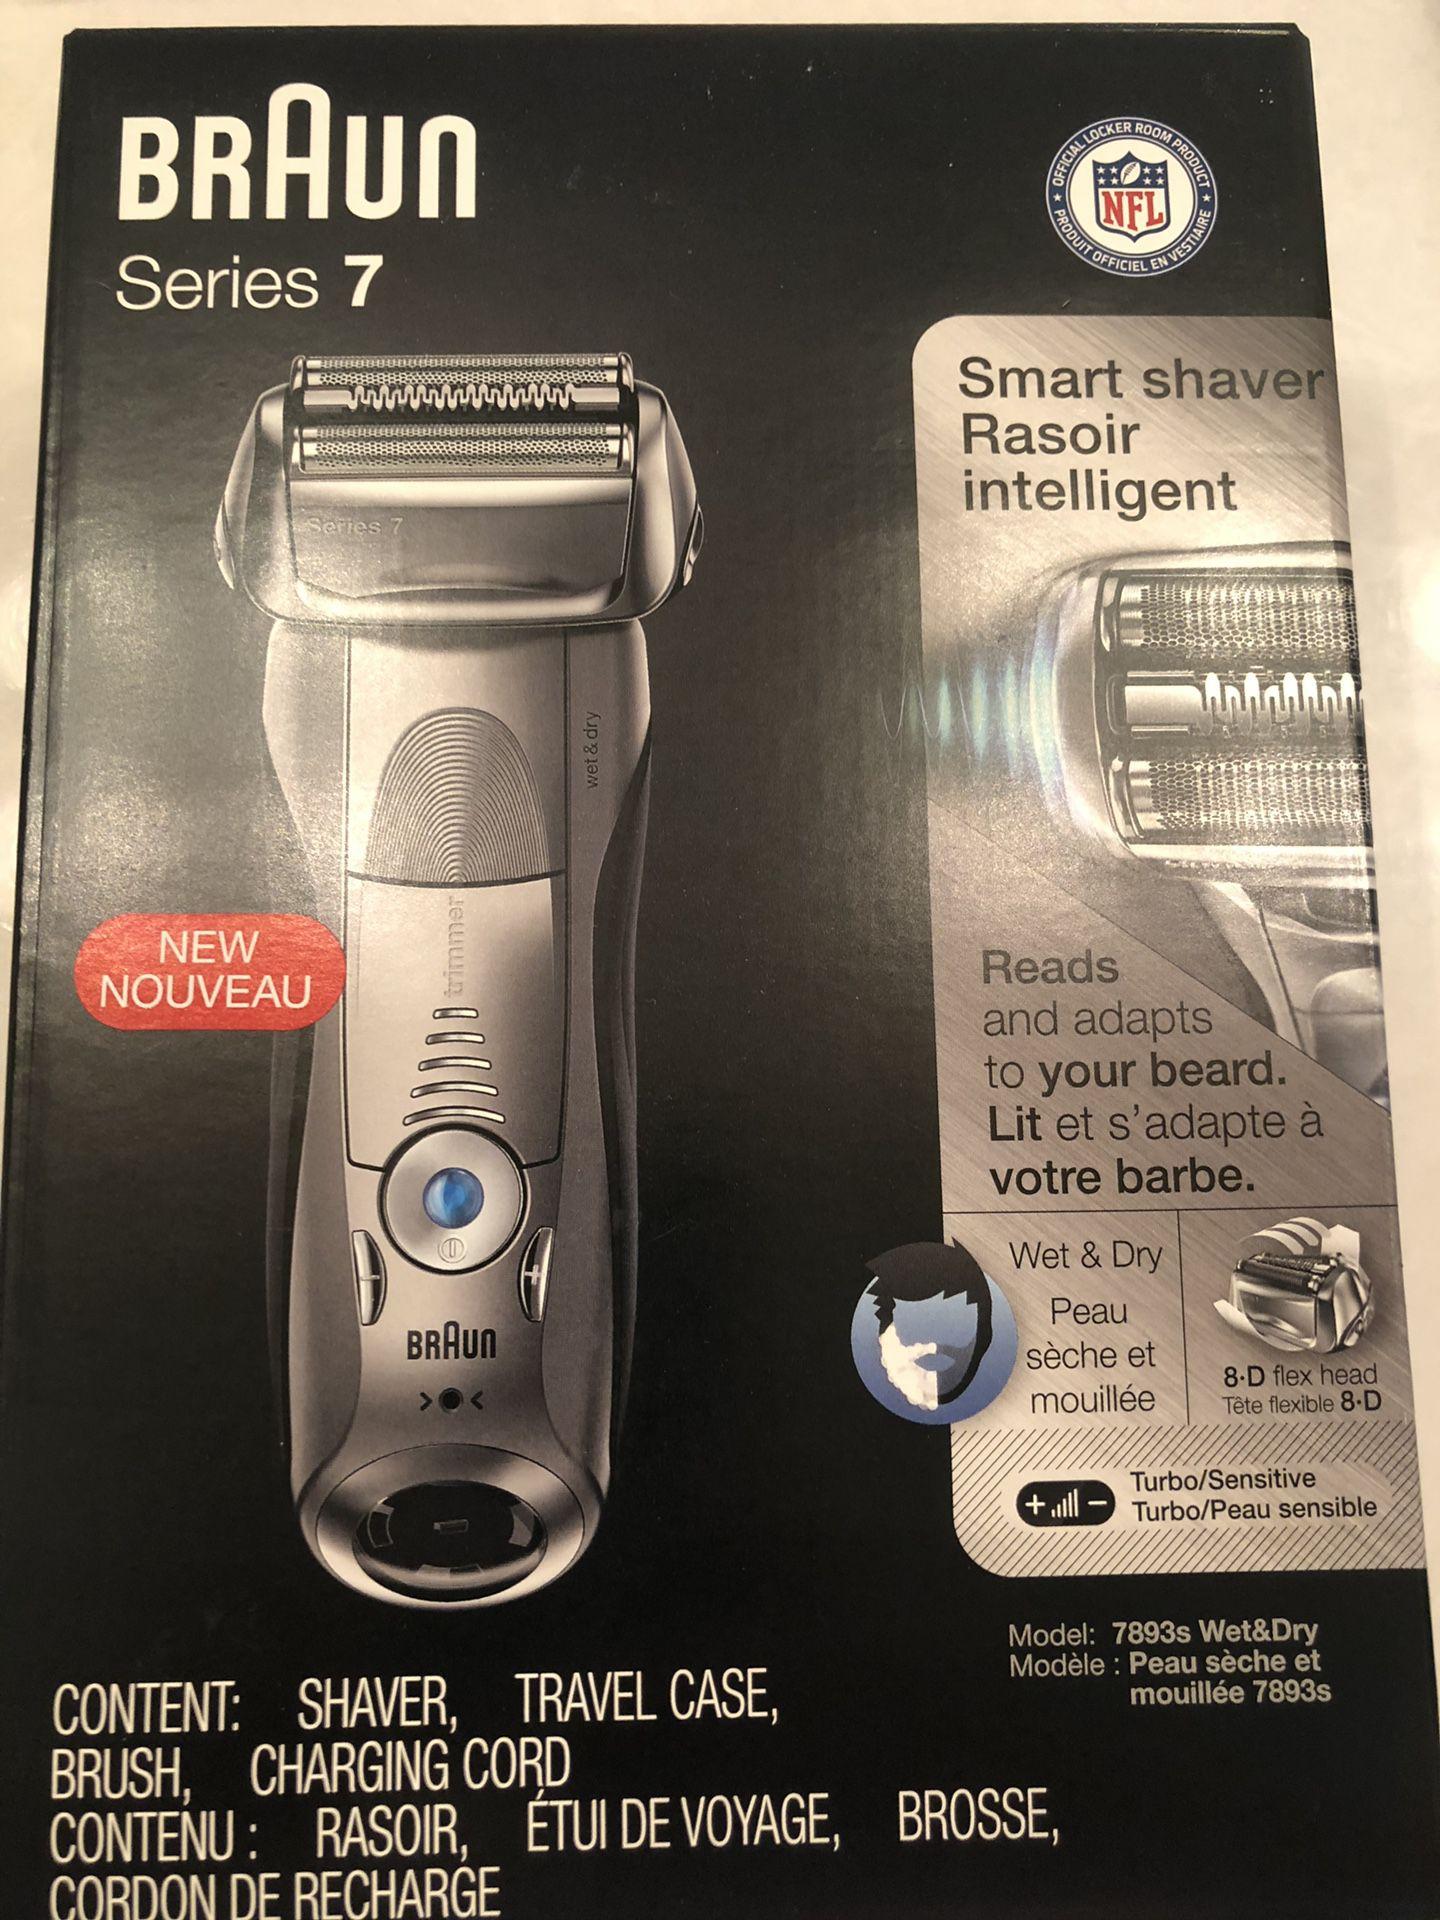 Braun 7 series shaver